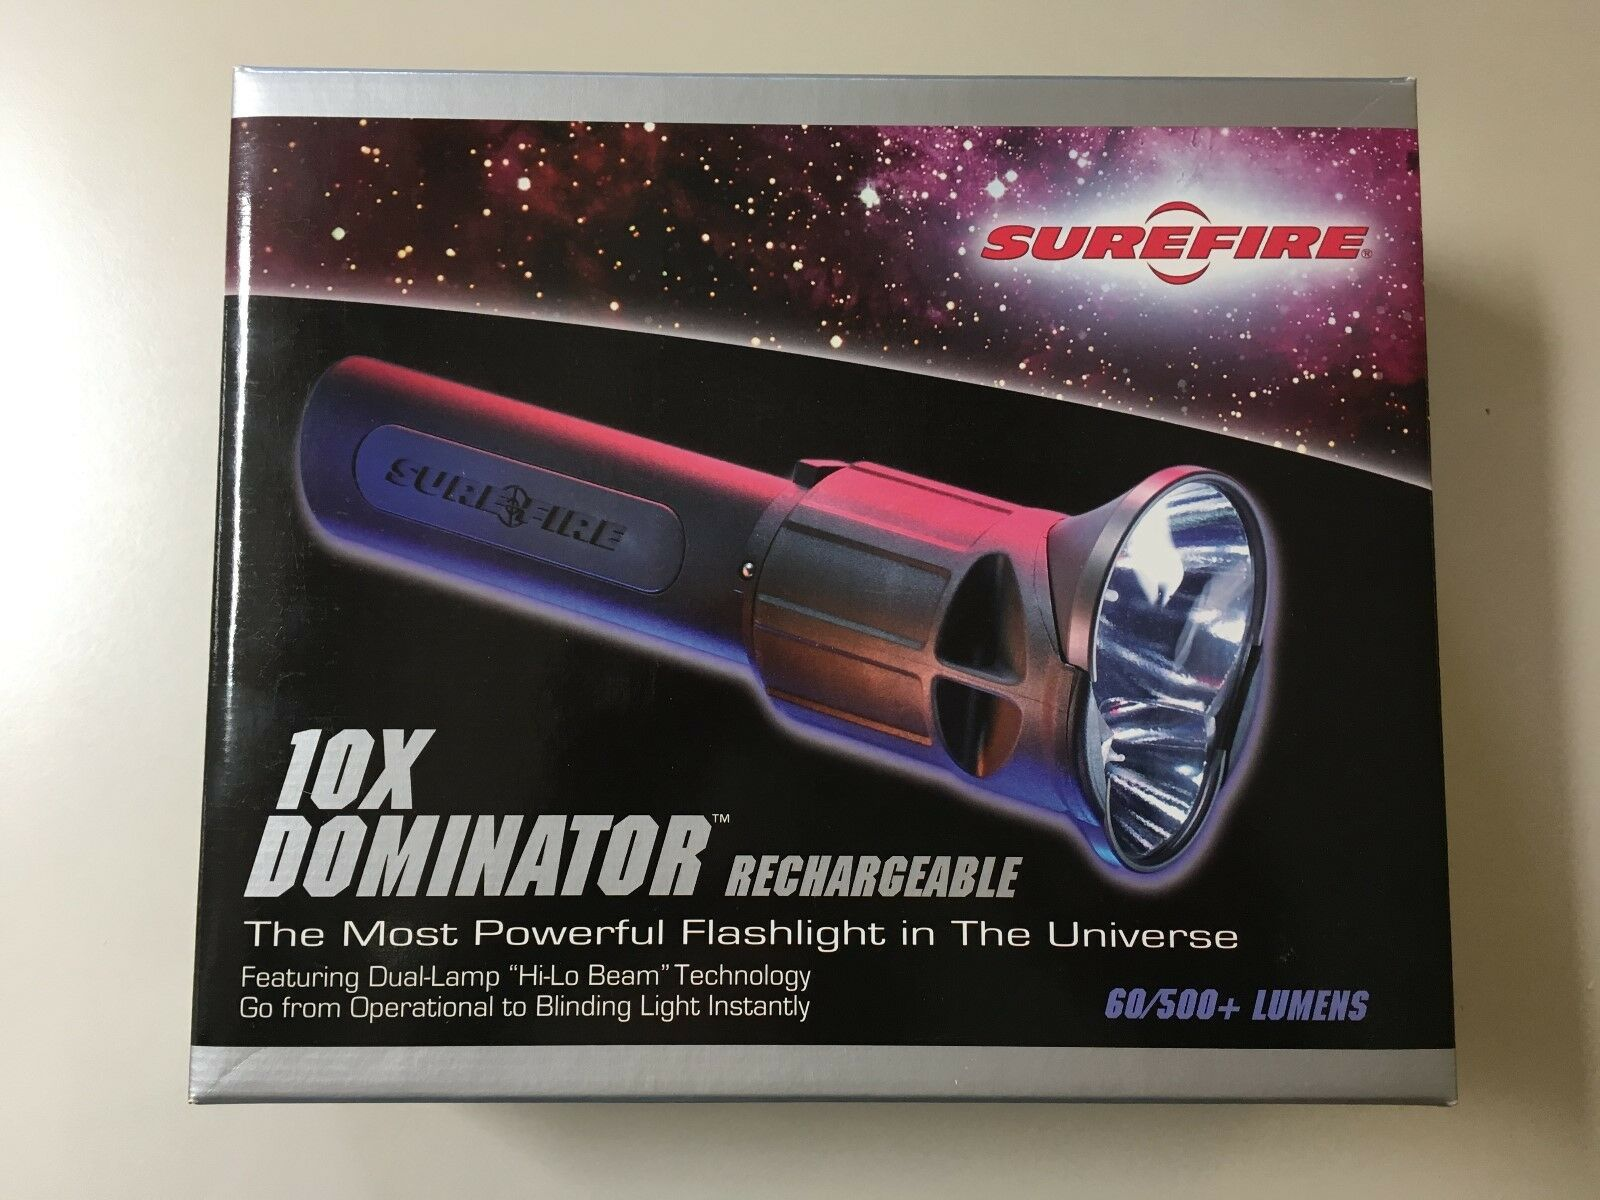 Surefire 10x Dominator Dual Lamp perforhommece Tactical Flashlumière - All Original